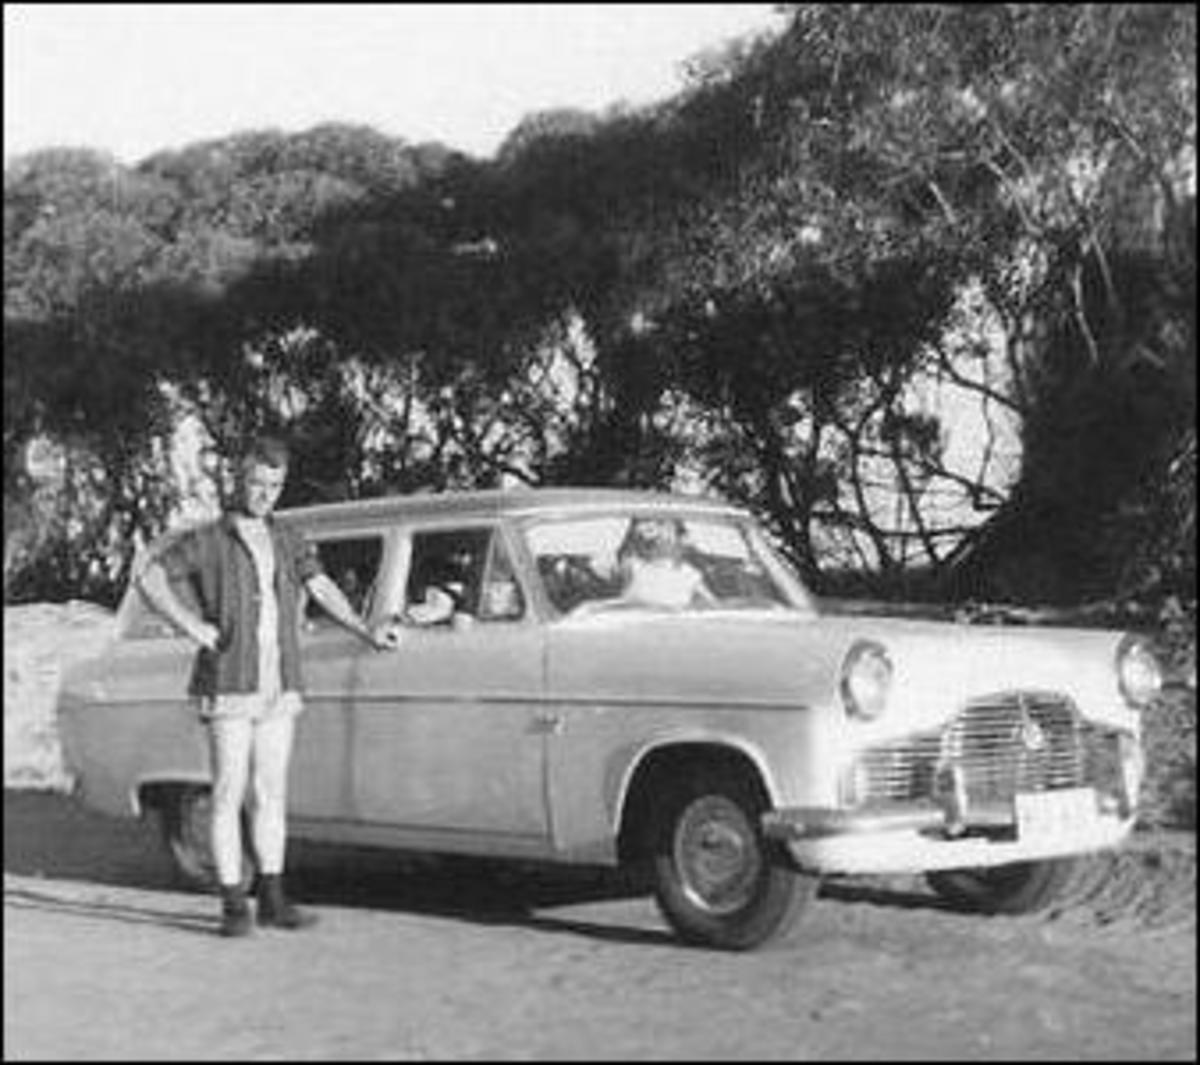 Enjoying the Outback in Australia in 1967